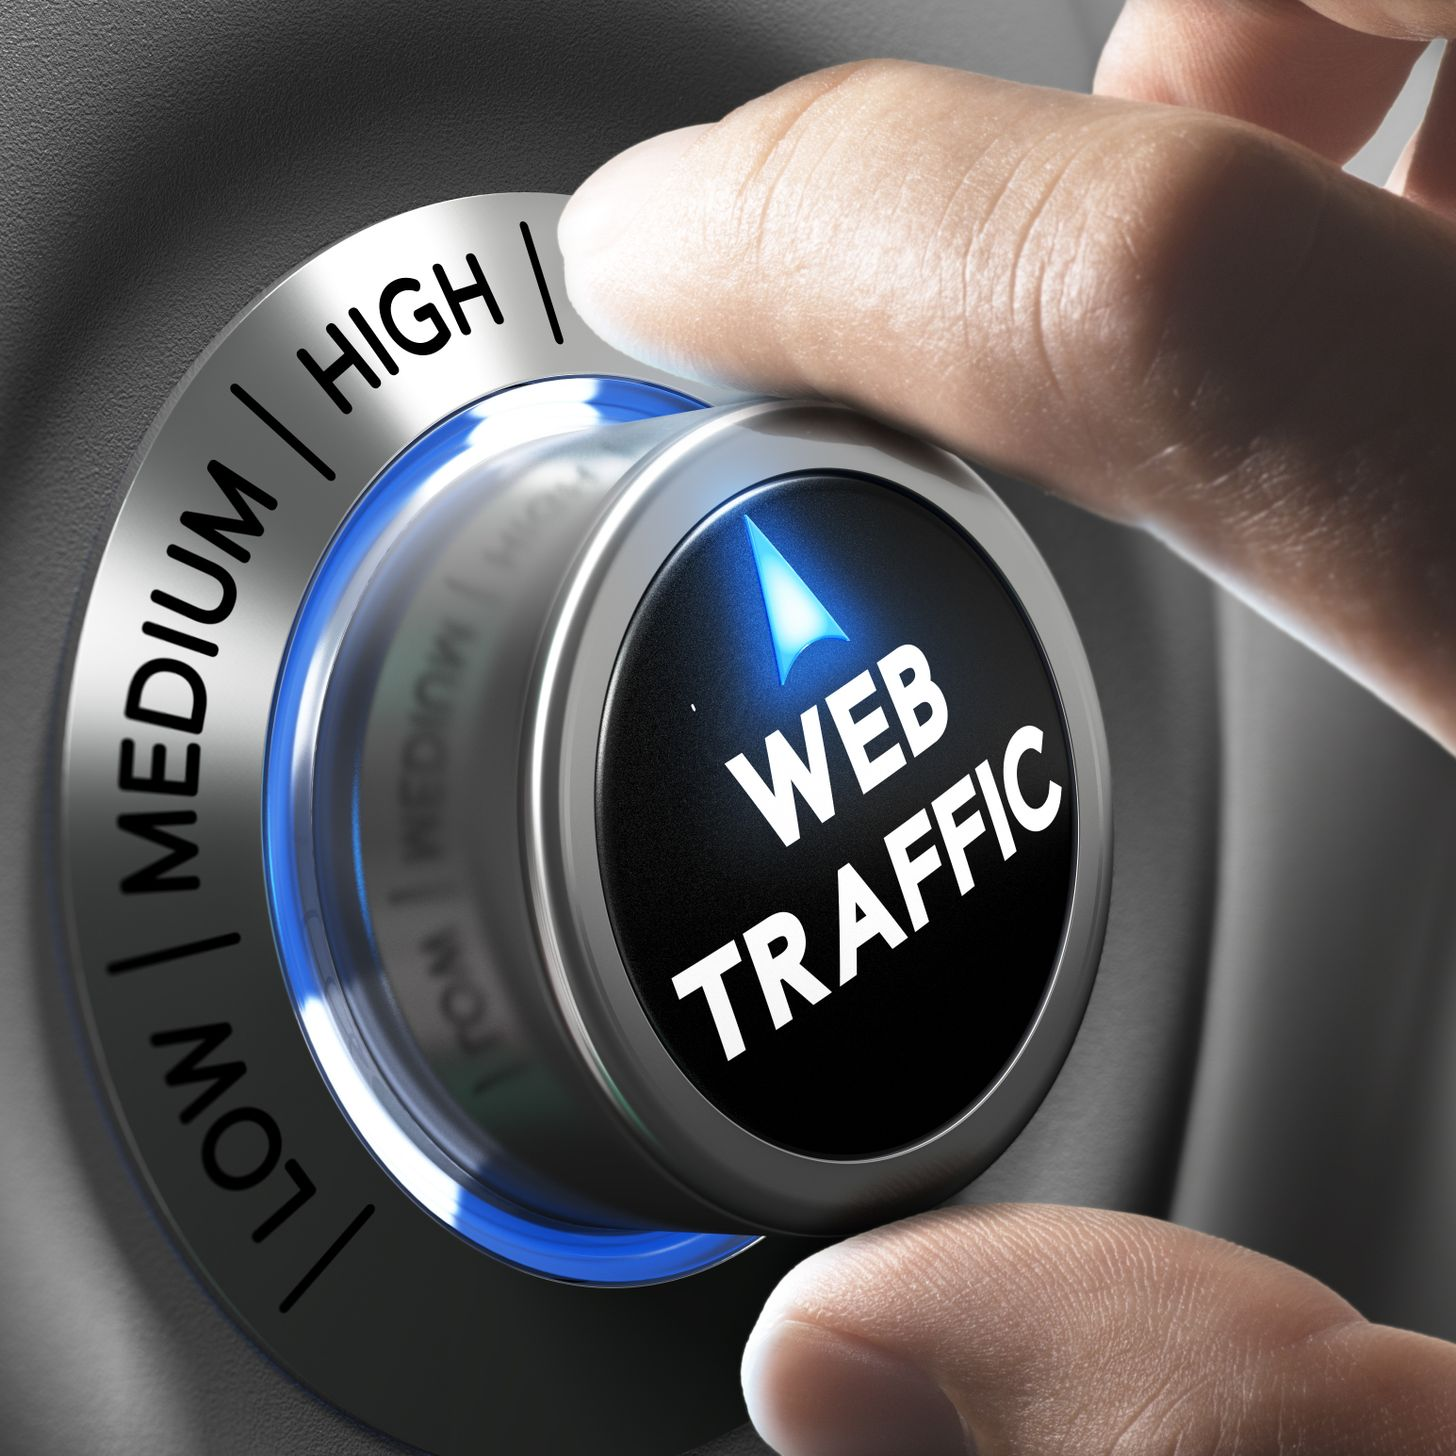 web traffic seo.jpg